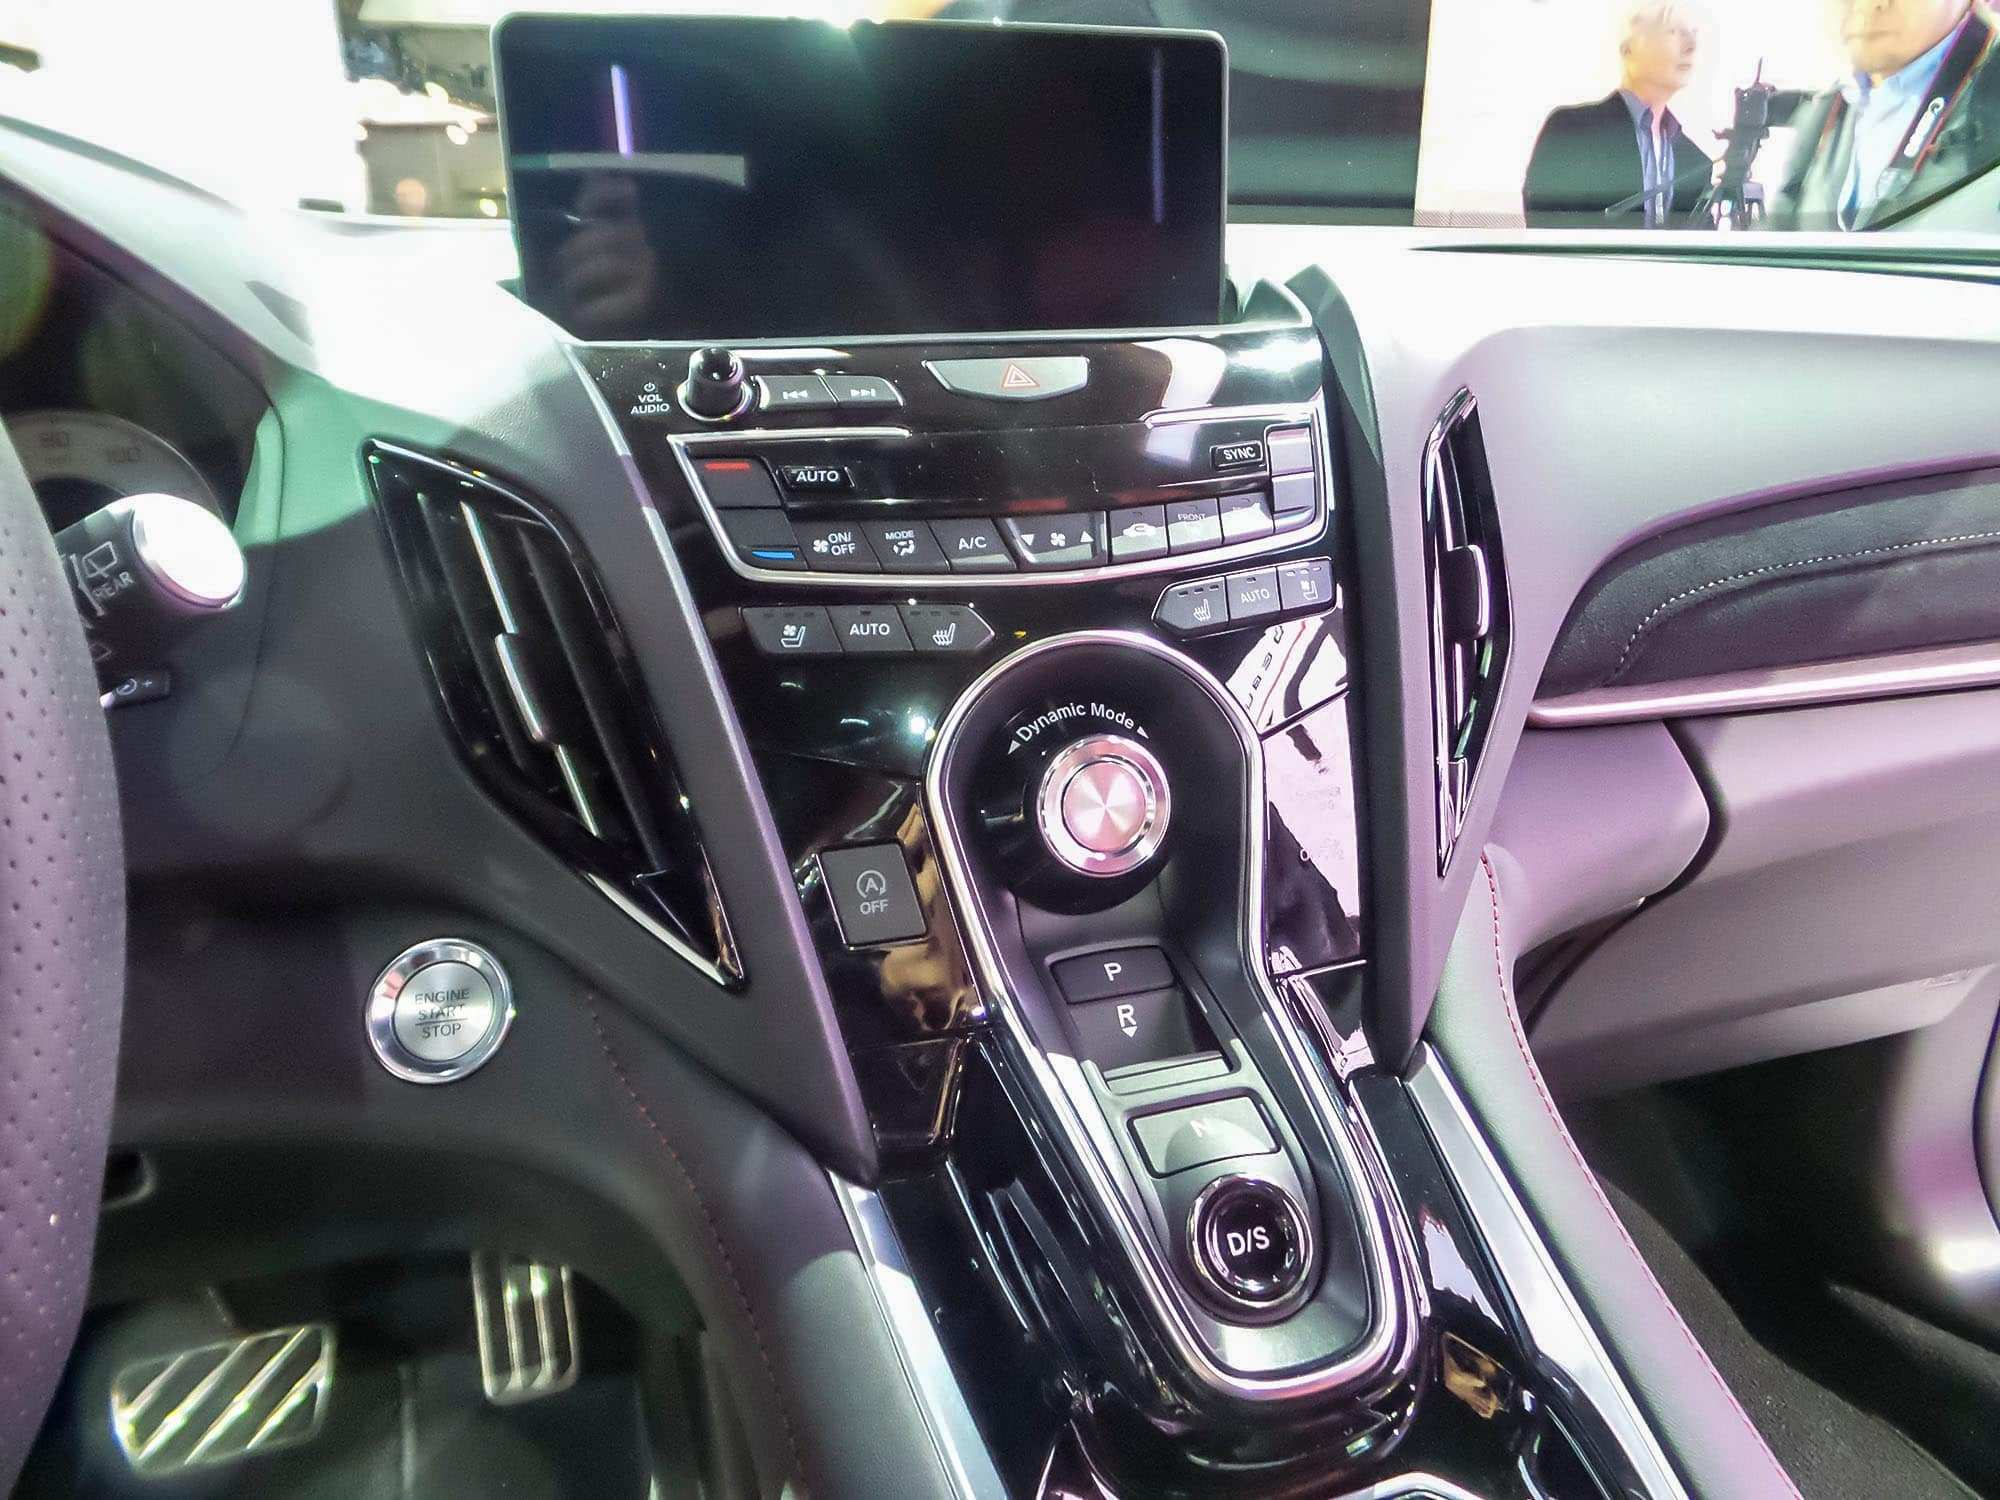 58 New 2019 Acura Rdx Engine Reviews with 2019 Acura Rdx Engine